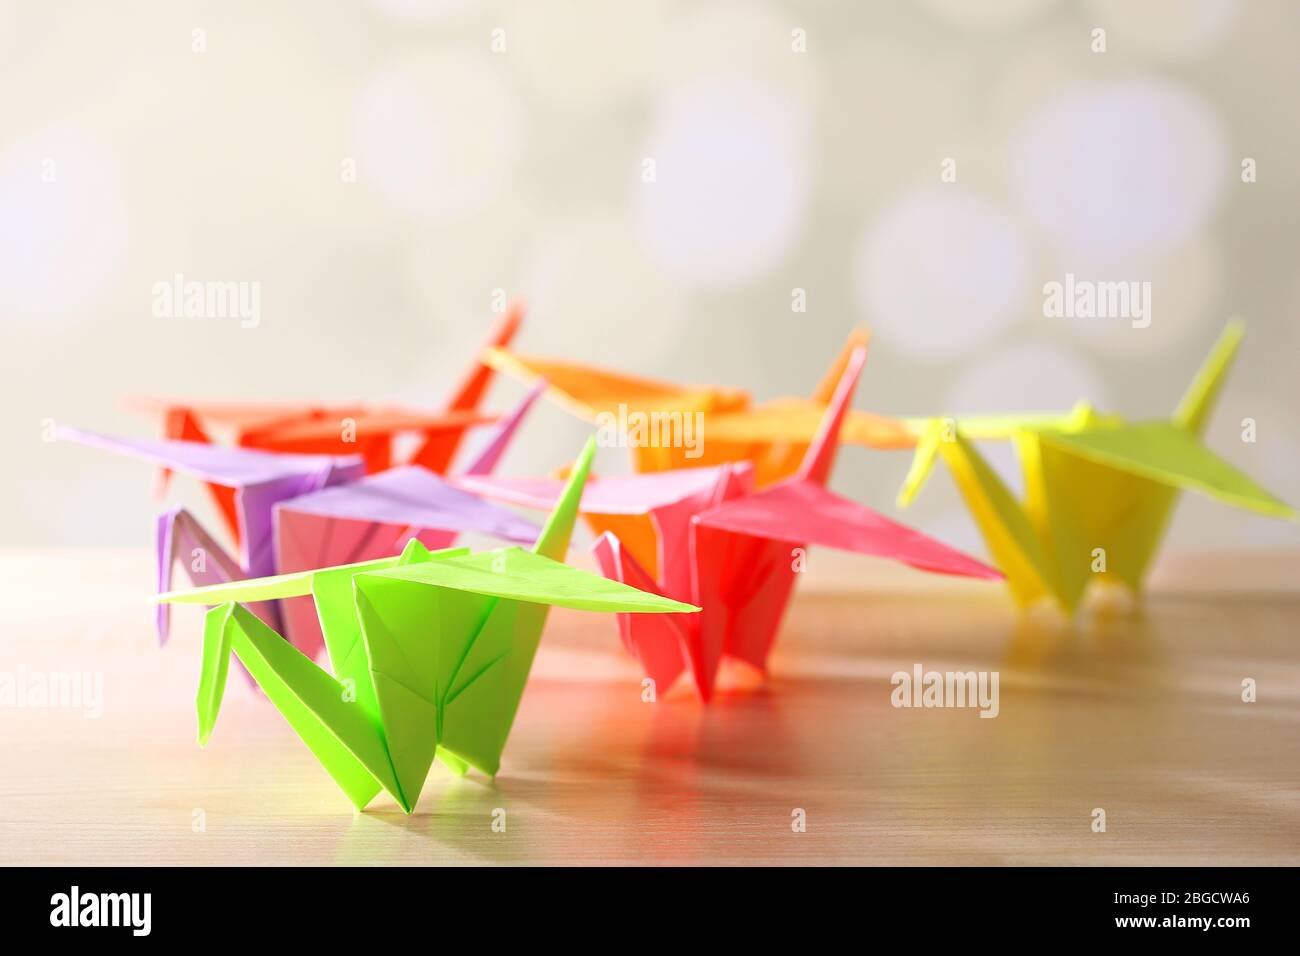 Origami Crane Instructions | 956x1300